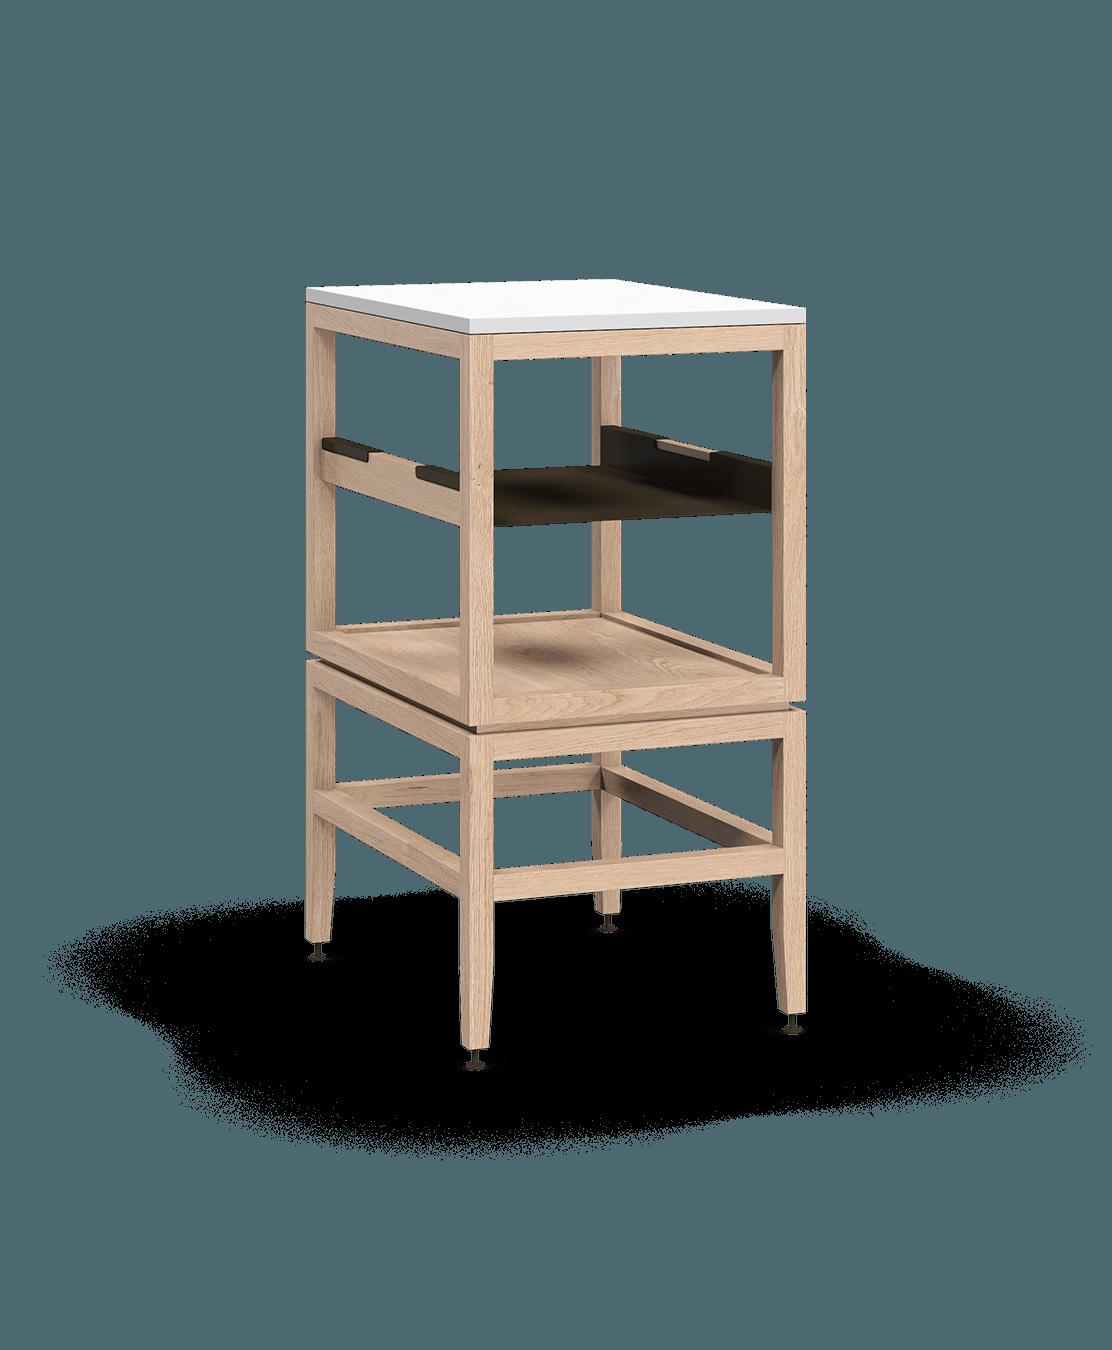 coquo volitare white oak solid wood modular cube 1 shelf storage open cabinet 18 inch C2-N-1824-0011-NA